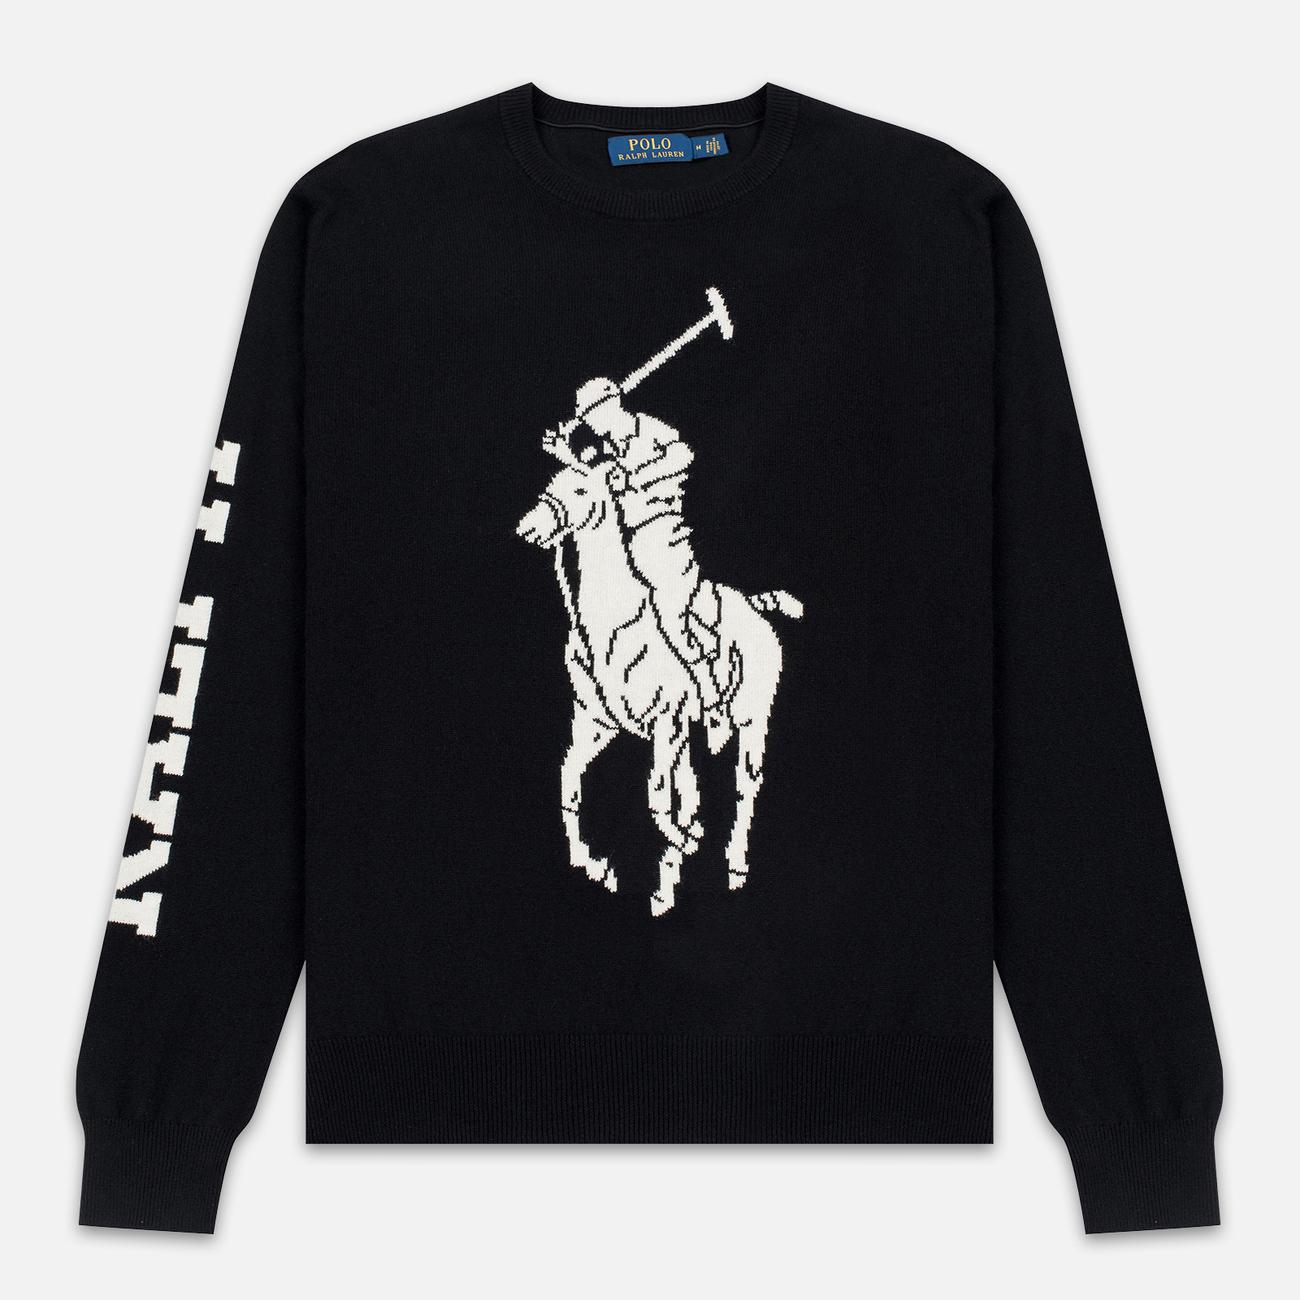 Мужской свитер Polo Ralph Lauren Loryelle Wool Big Polo Pony Black/Cream